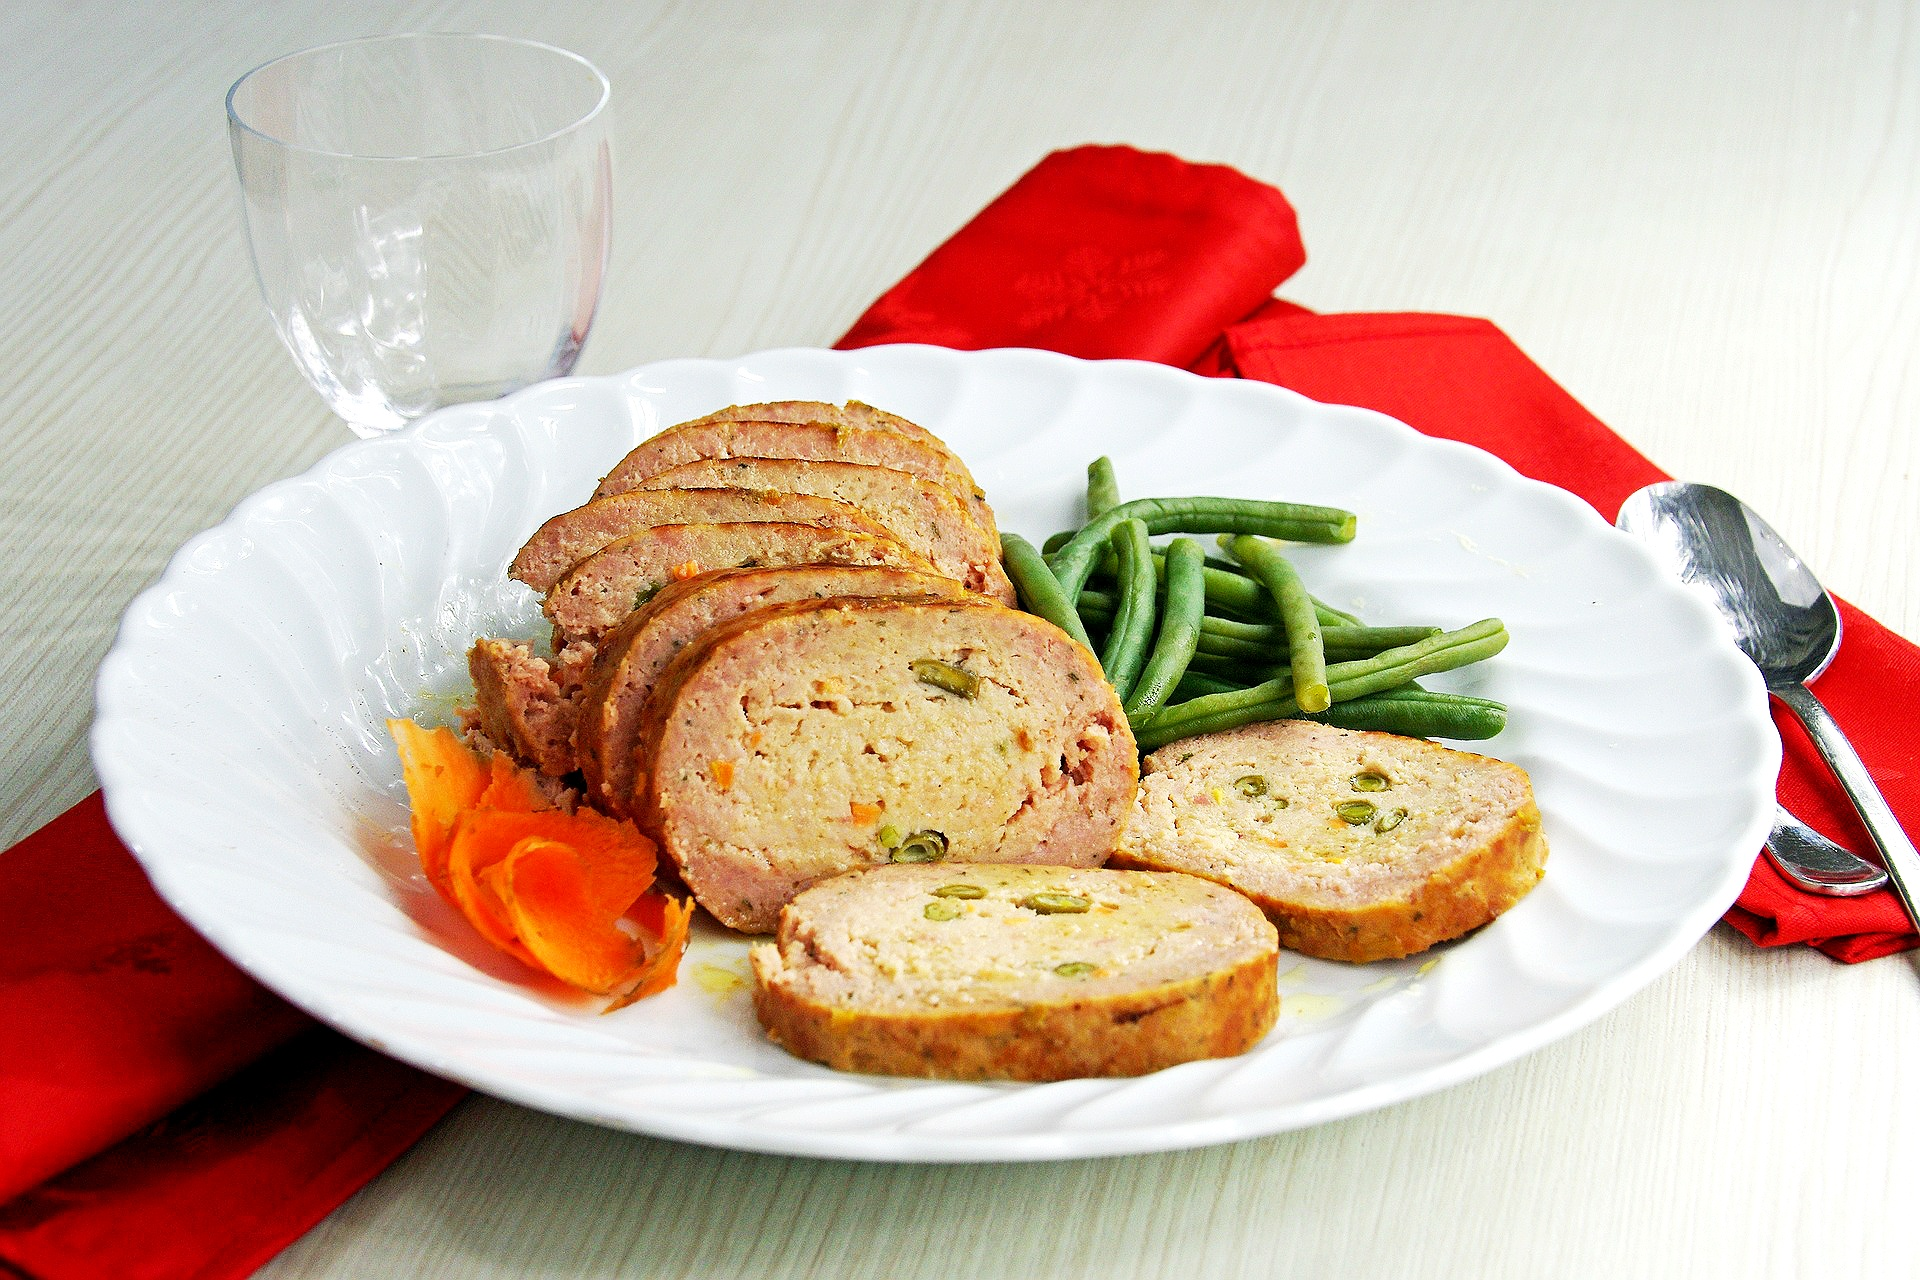 Receta de lomo de cerdo asado para la cena